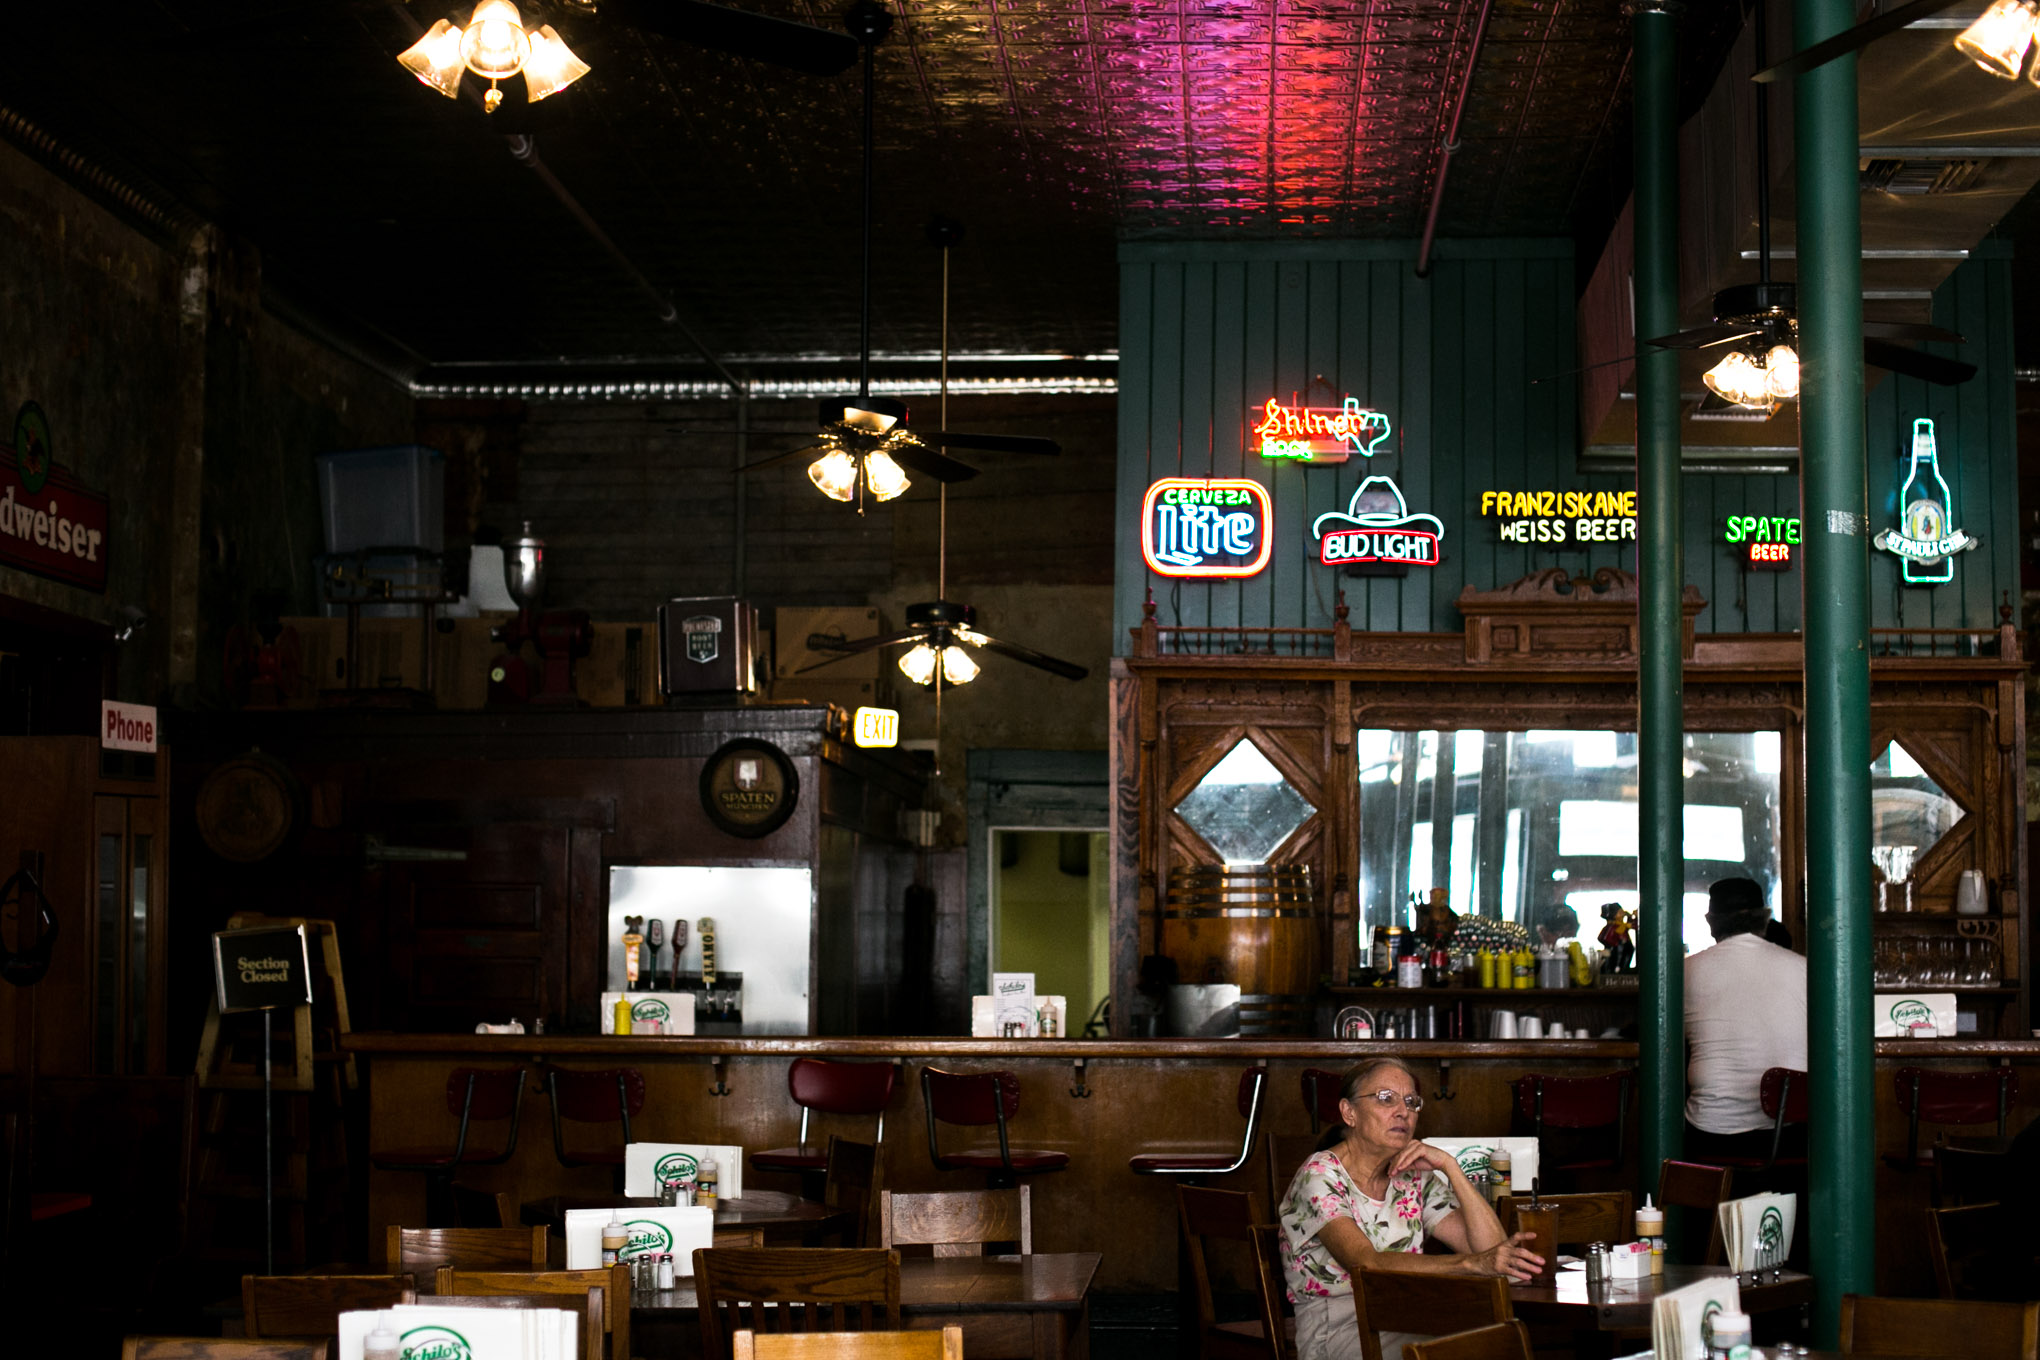 Schilo's Restaurant has been open in San Antonio for 99 years. Photo by Kathryn Boyd-Batstone.